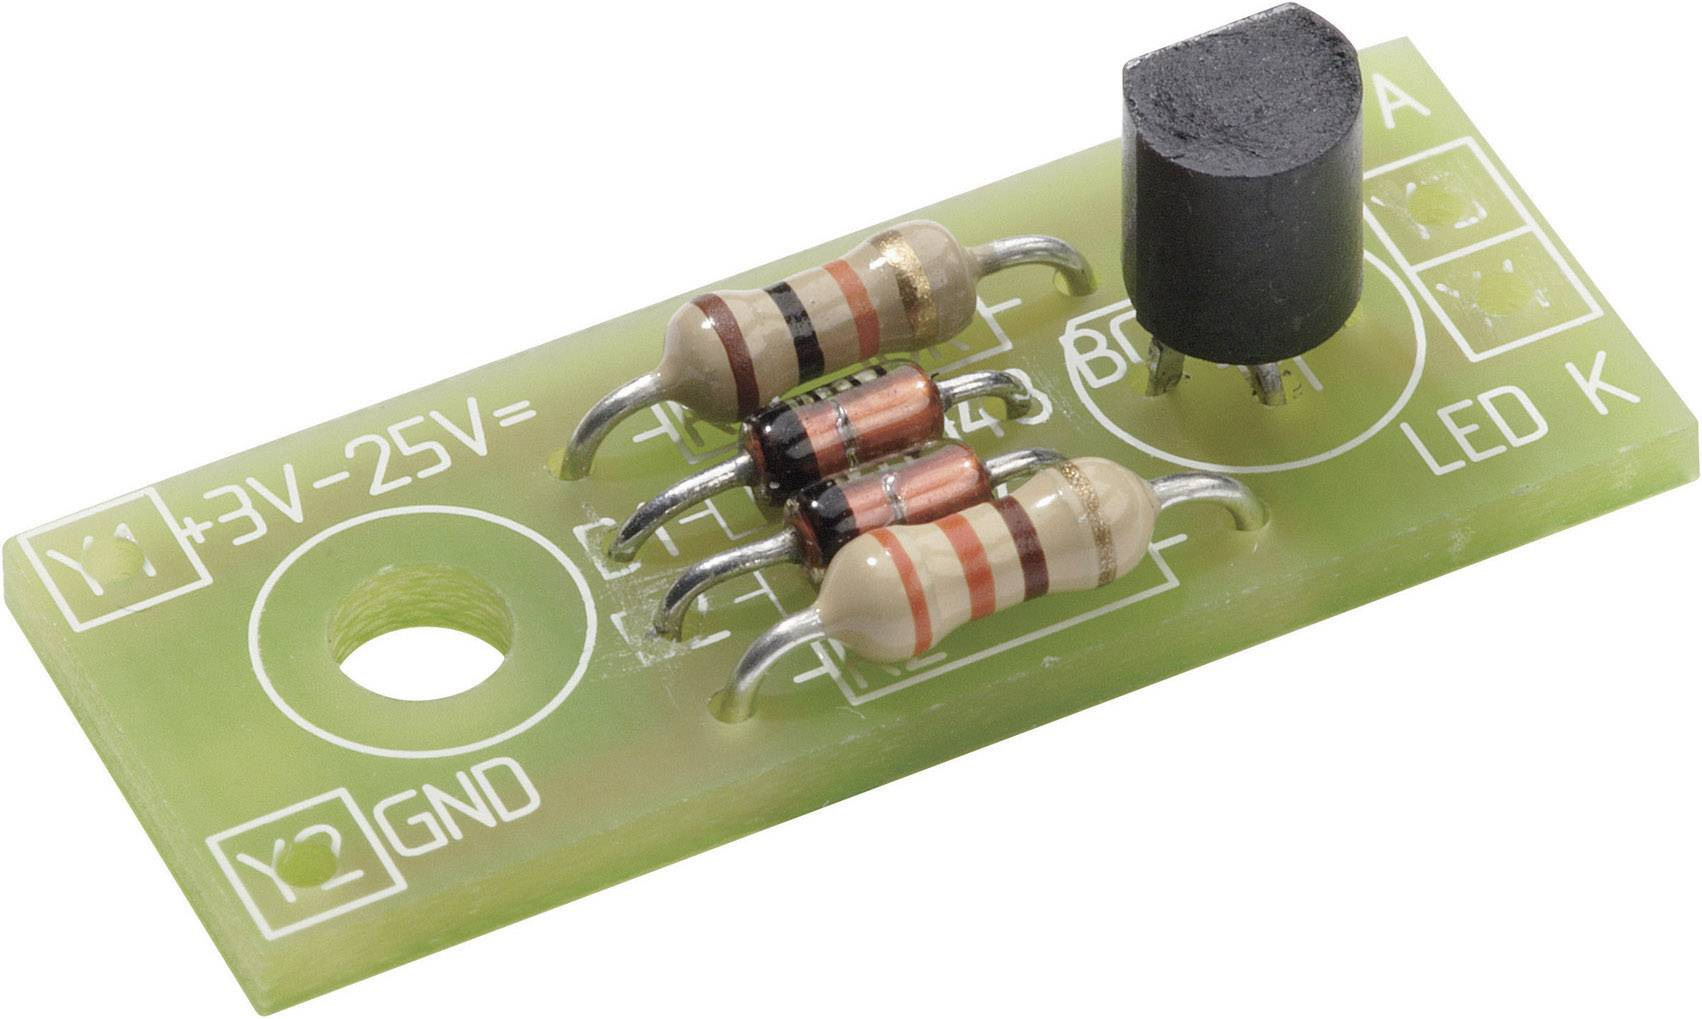 Conrad Components 191192, 3 V/DC, 6 V/DC, 9 V/DC, 12 V/DC, 24 V/DC, stavebnica